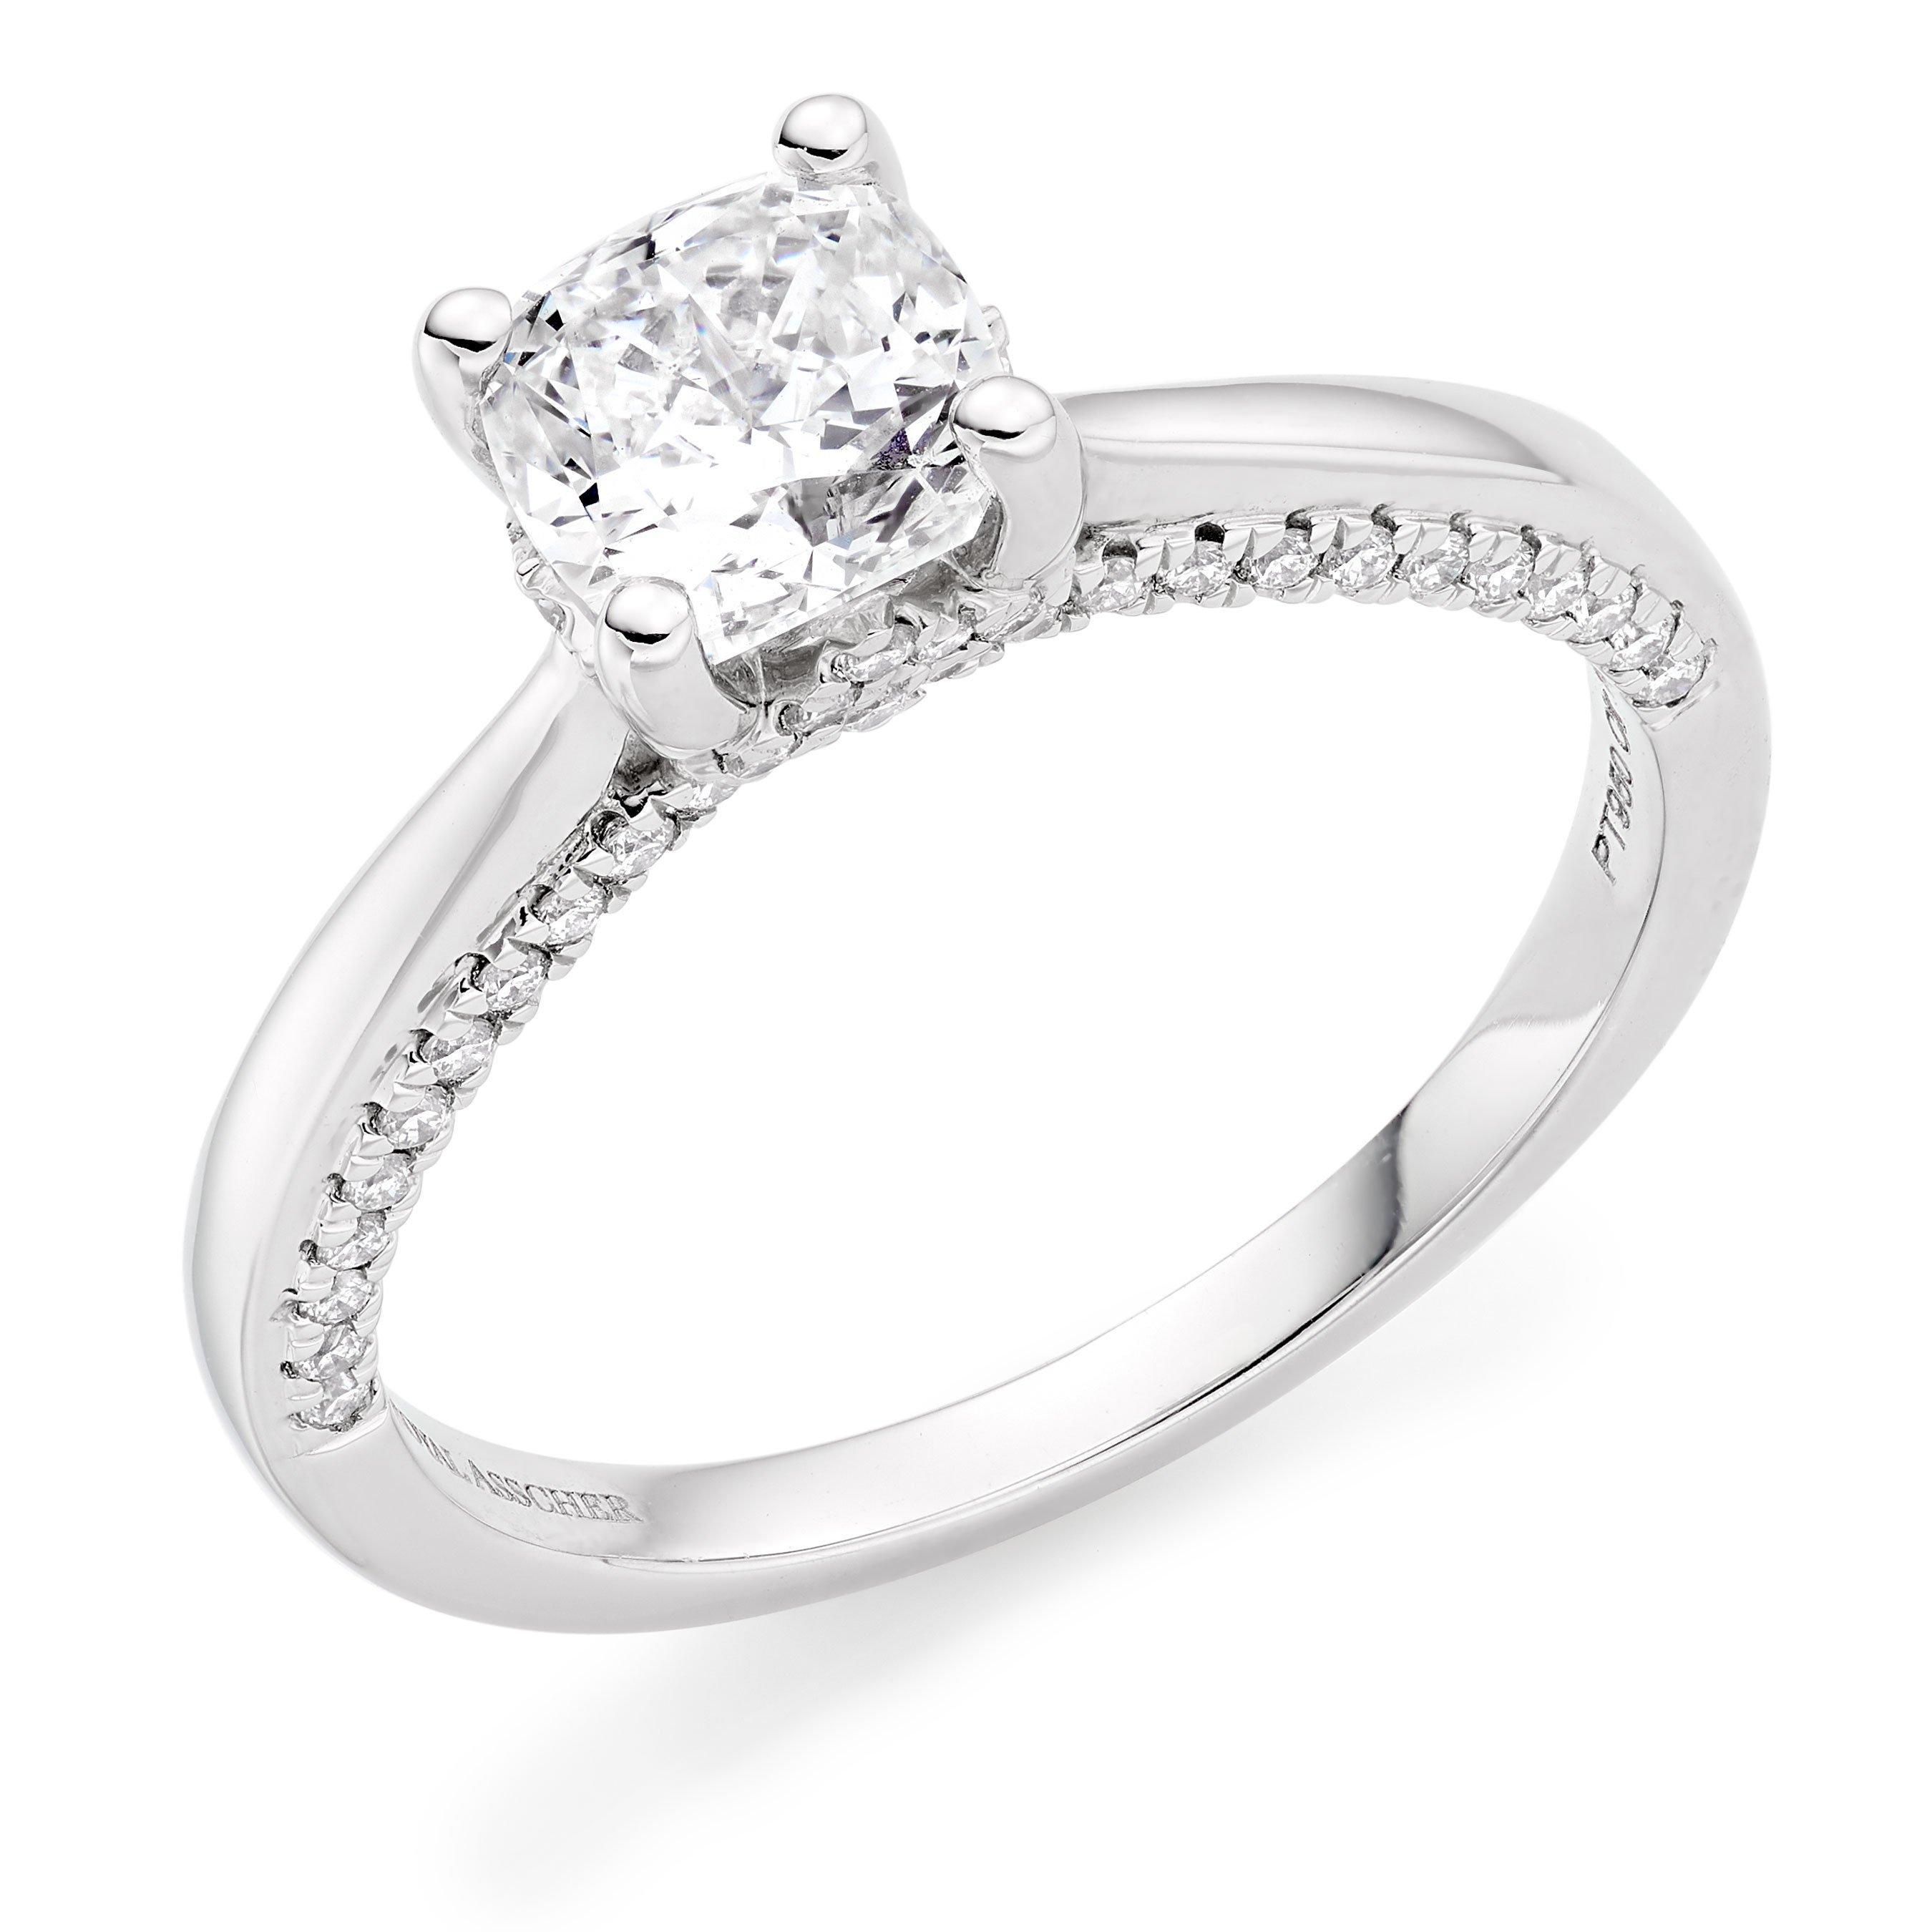 Royal Asscher Cushion Cut Platinum Diamond Solitaire Ring